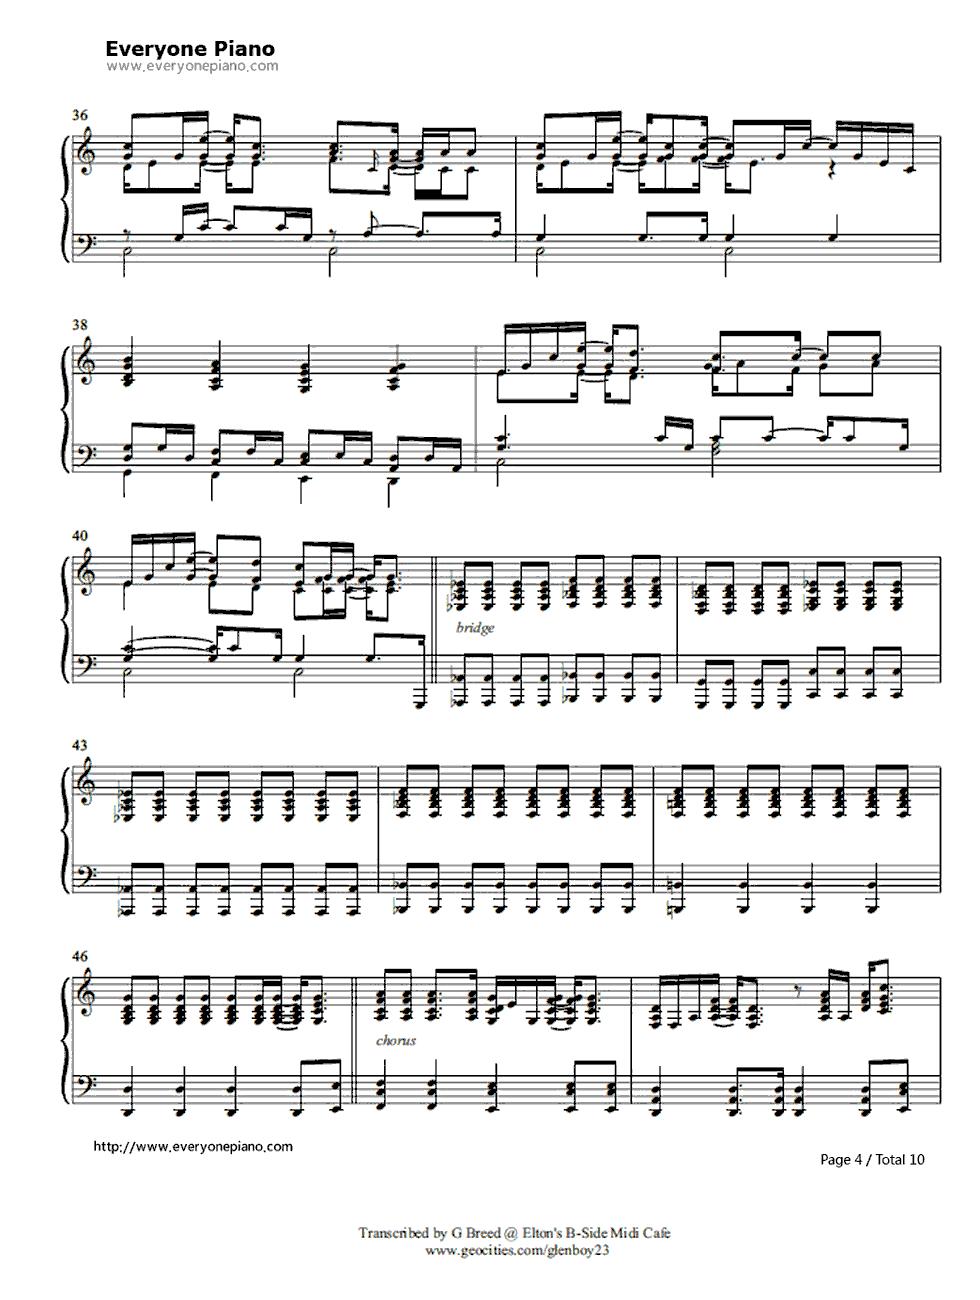 Tiny dancer elton john stave preview 4 free piano sheet music listen now print sheet tiny dancer elton john stave preview 4 hexwebz Images